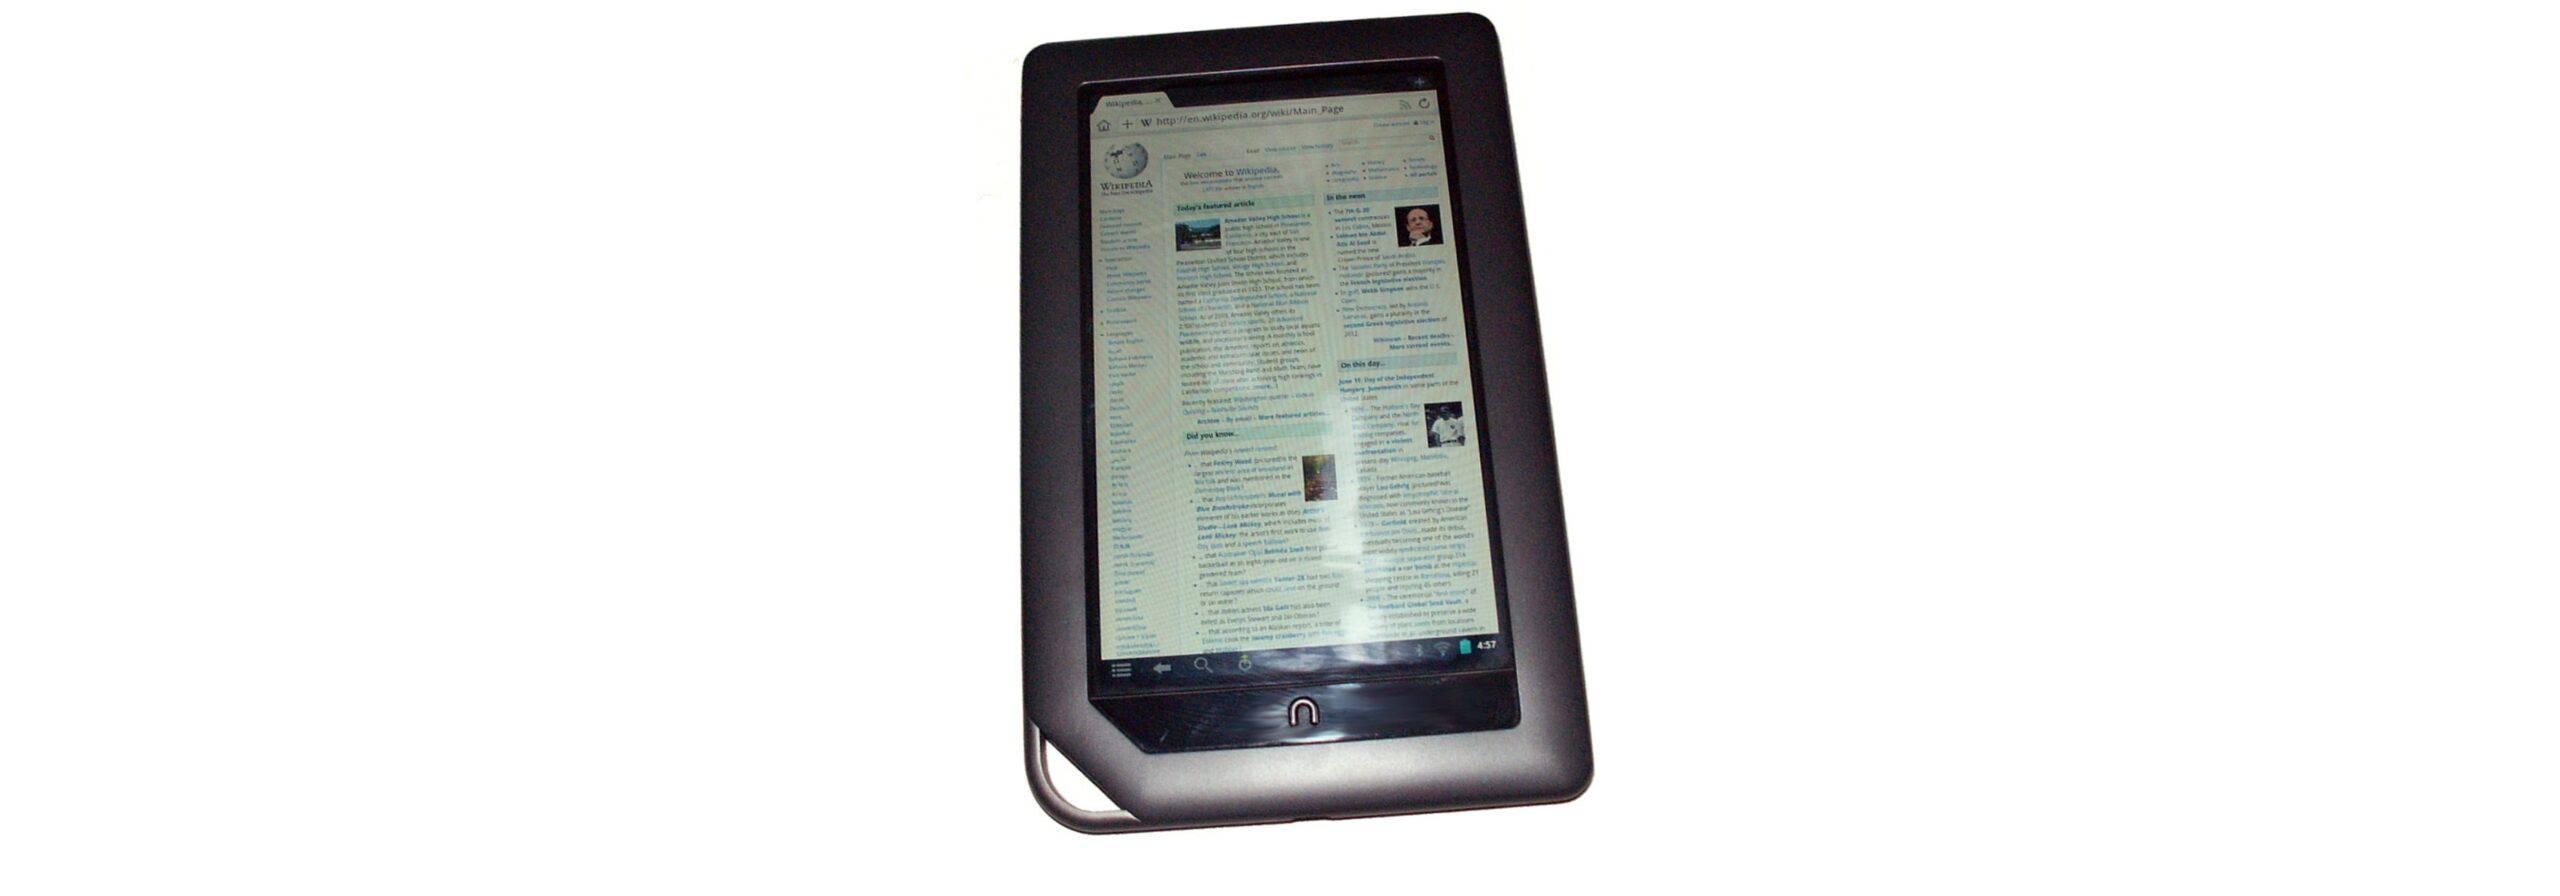 Barnes & Noble's Nook device